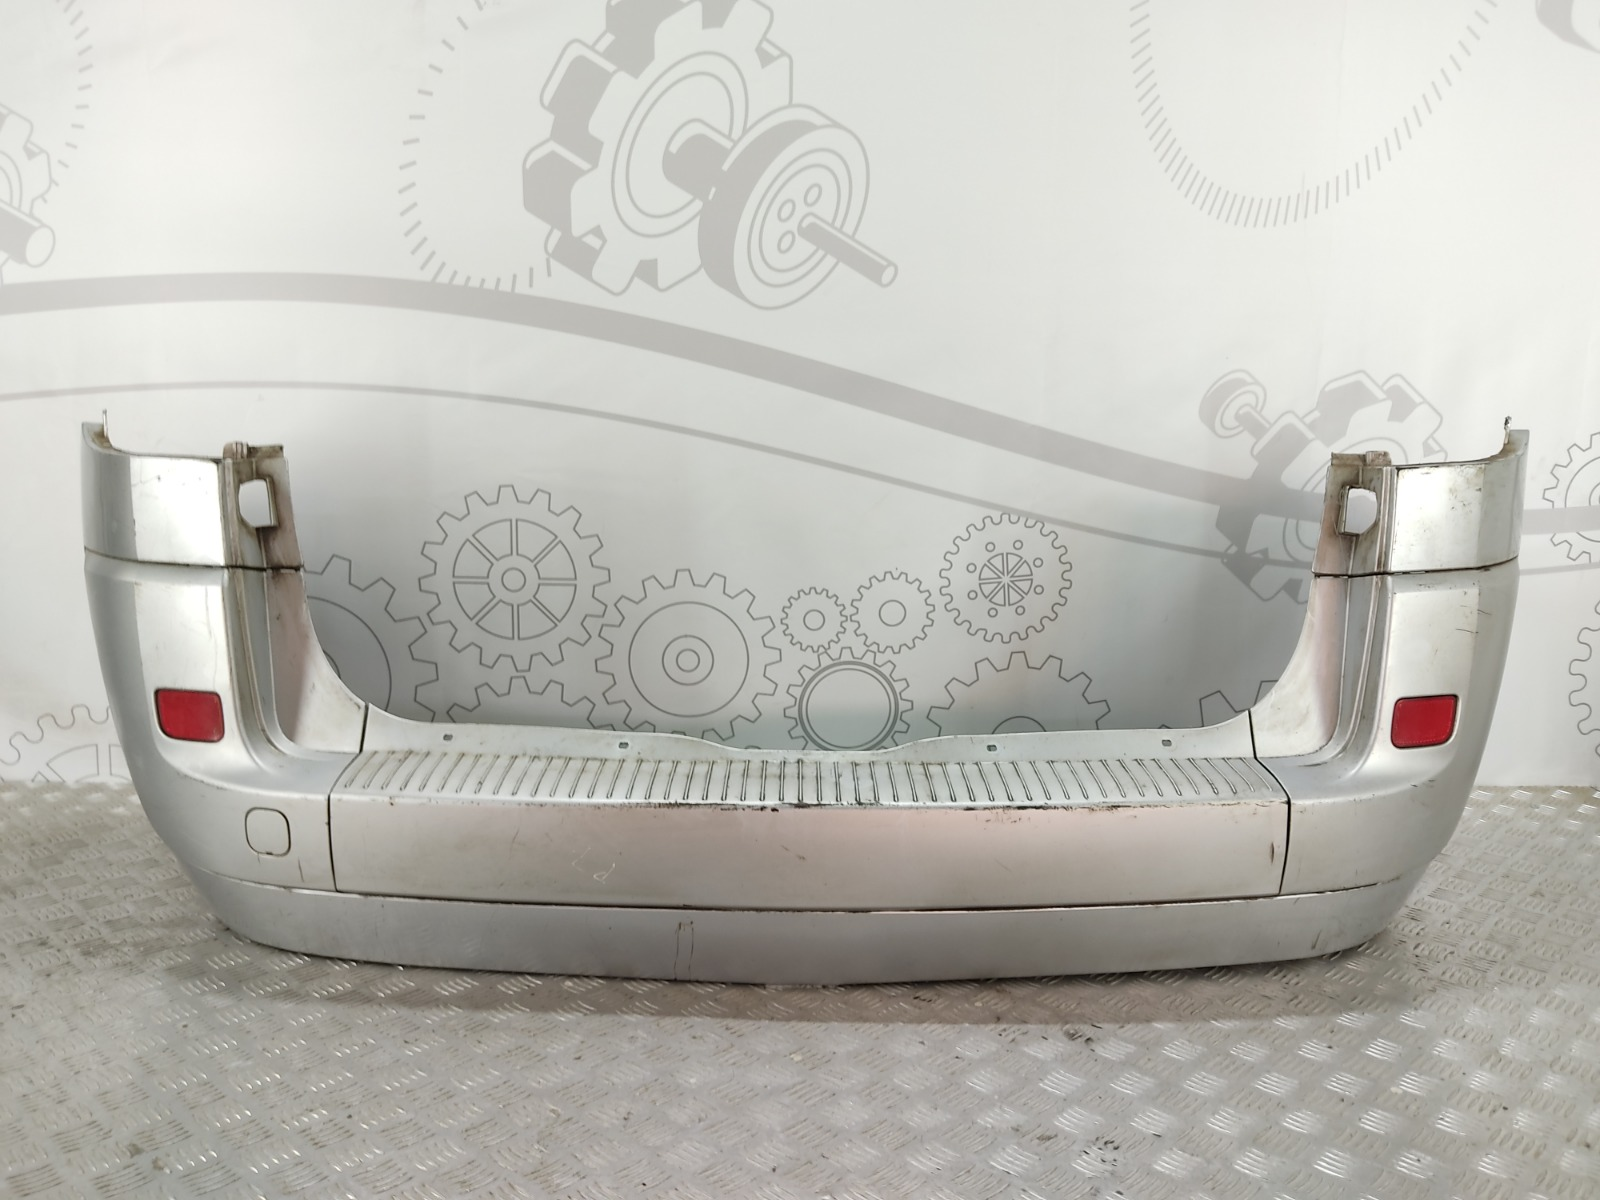 Бампер задний Renault Grand Scenic 2.0 I 2006 (б/у)